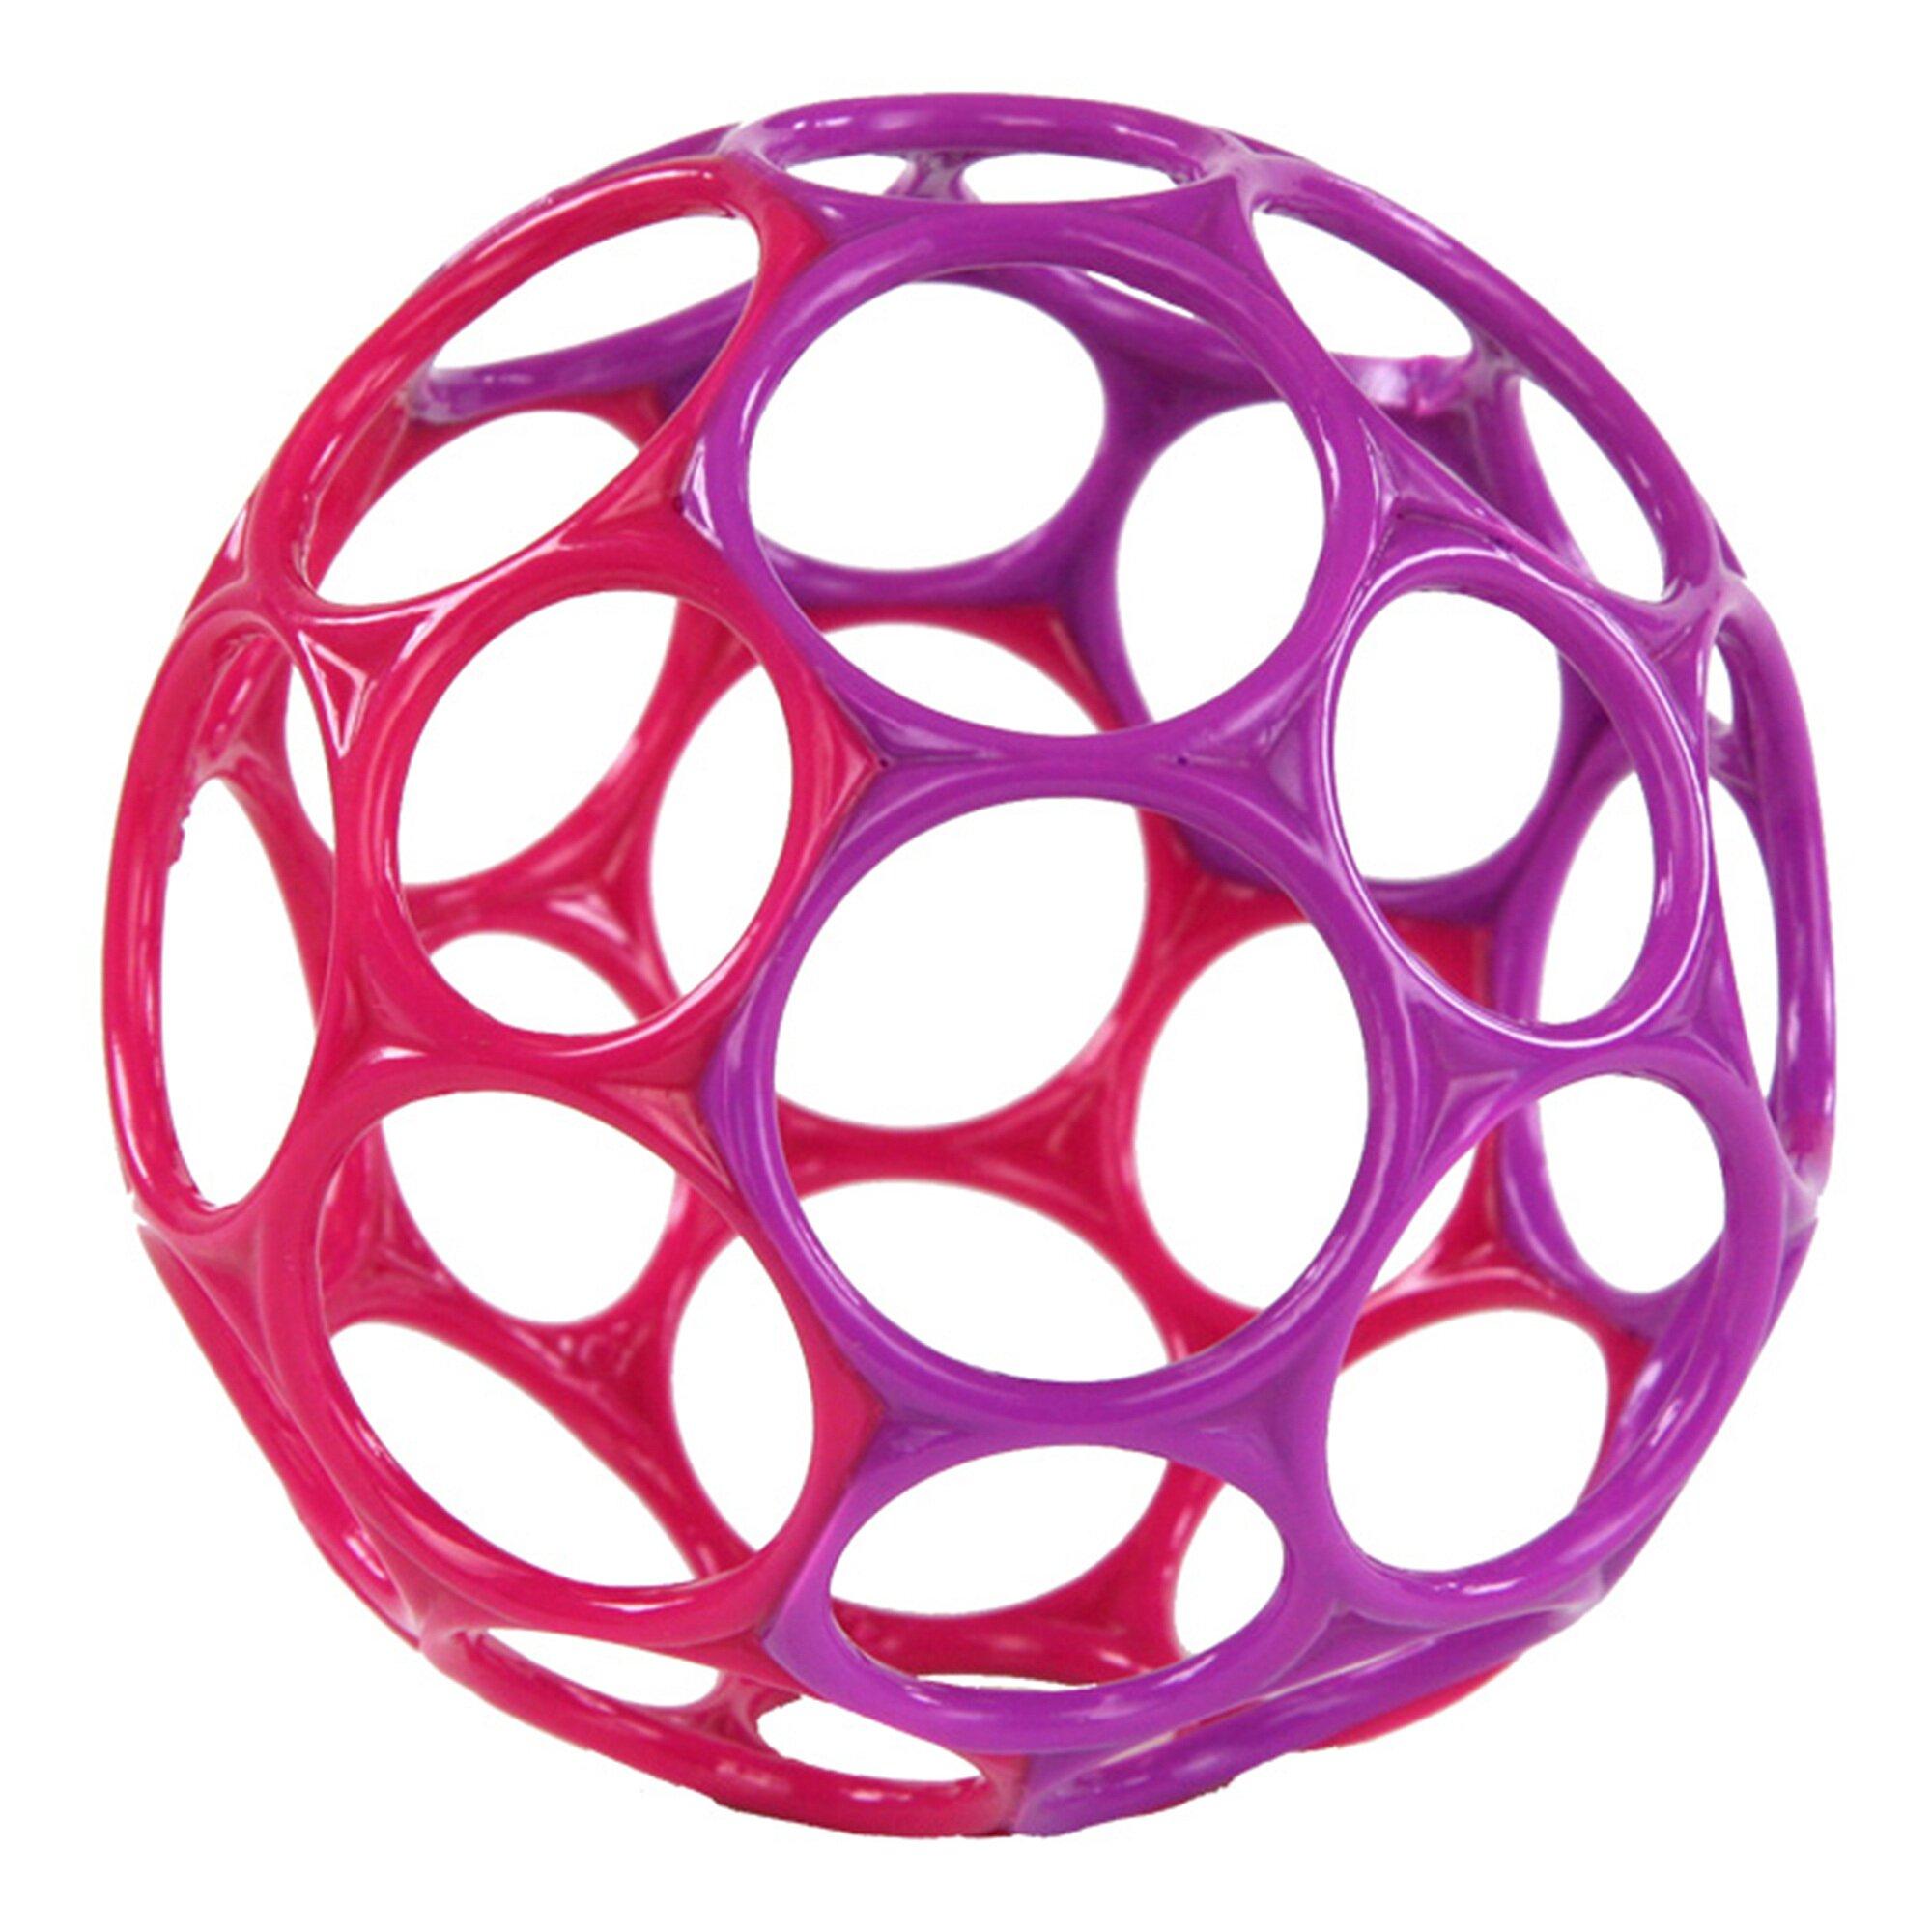 oball-ball-10-cm-mehrfarbig